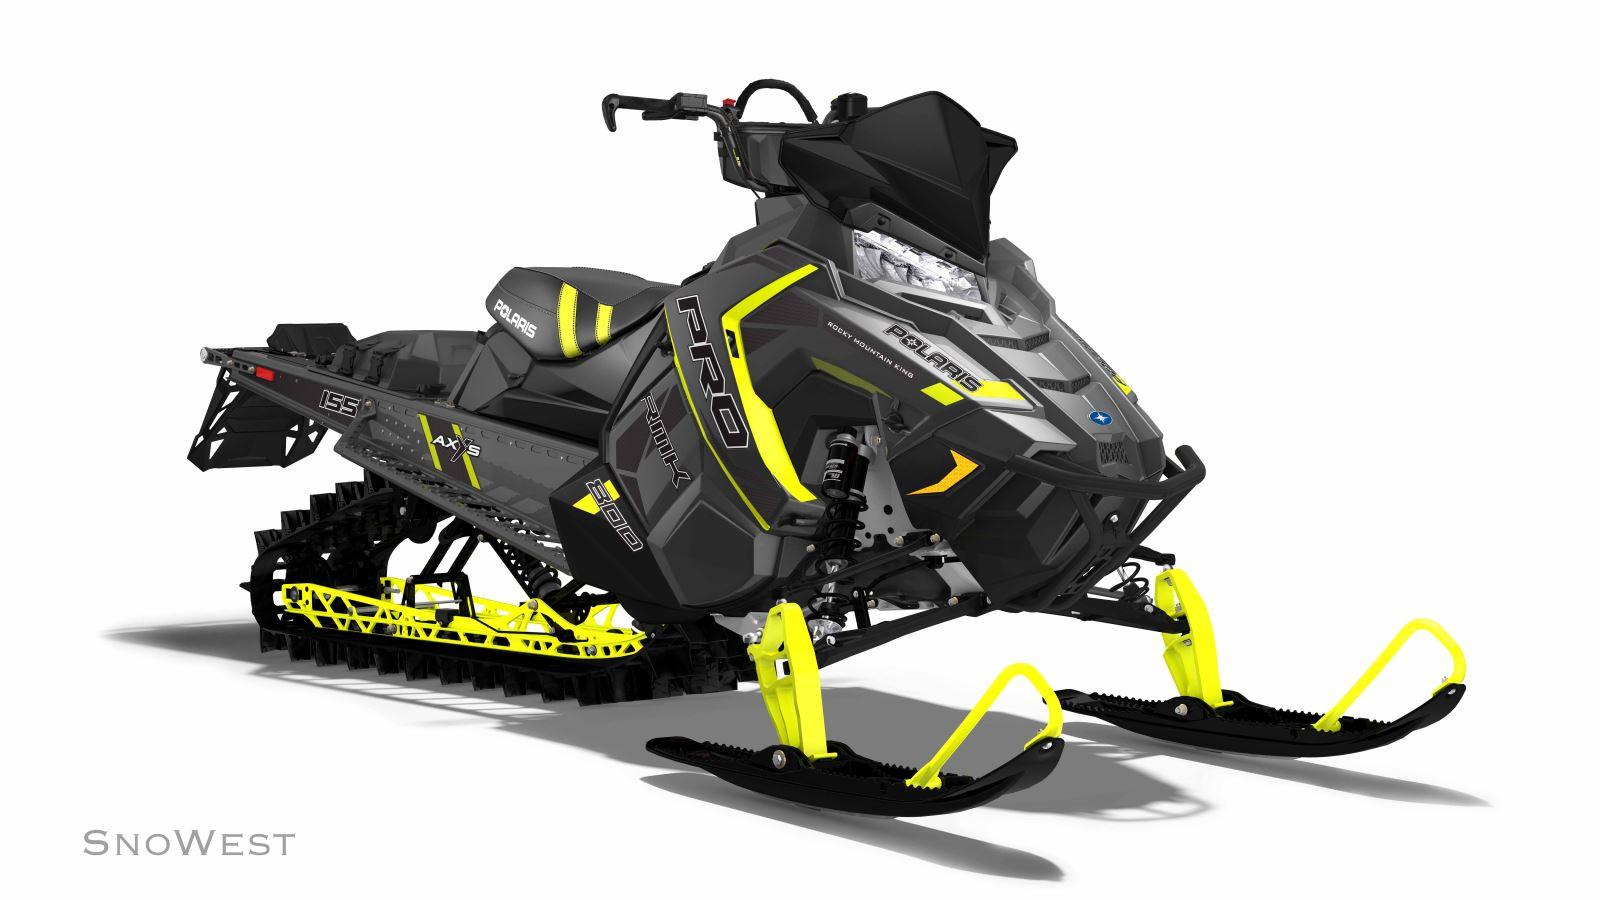 2016 yamaha mountain sleds autos post for 2016 yamaha sleds